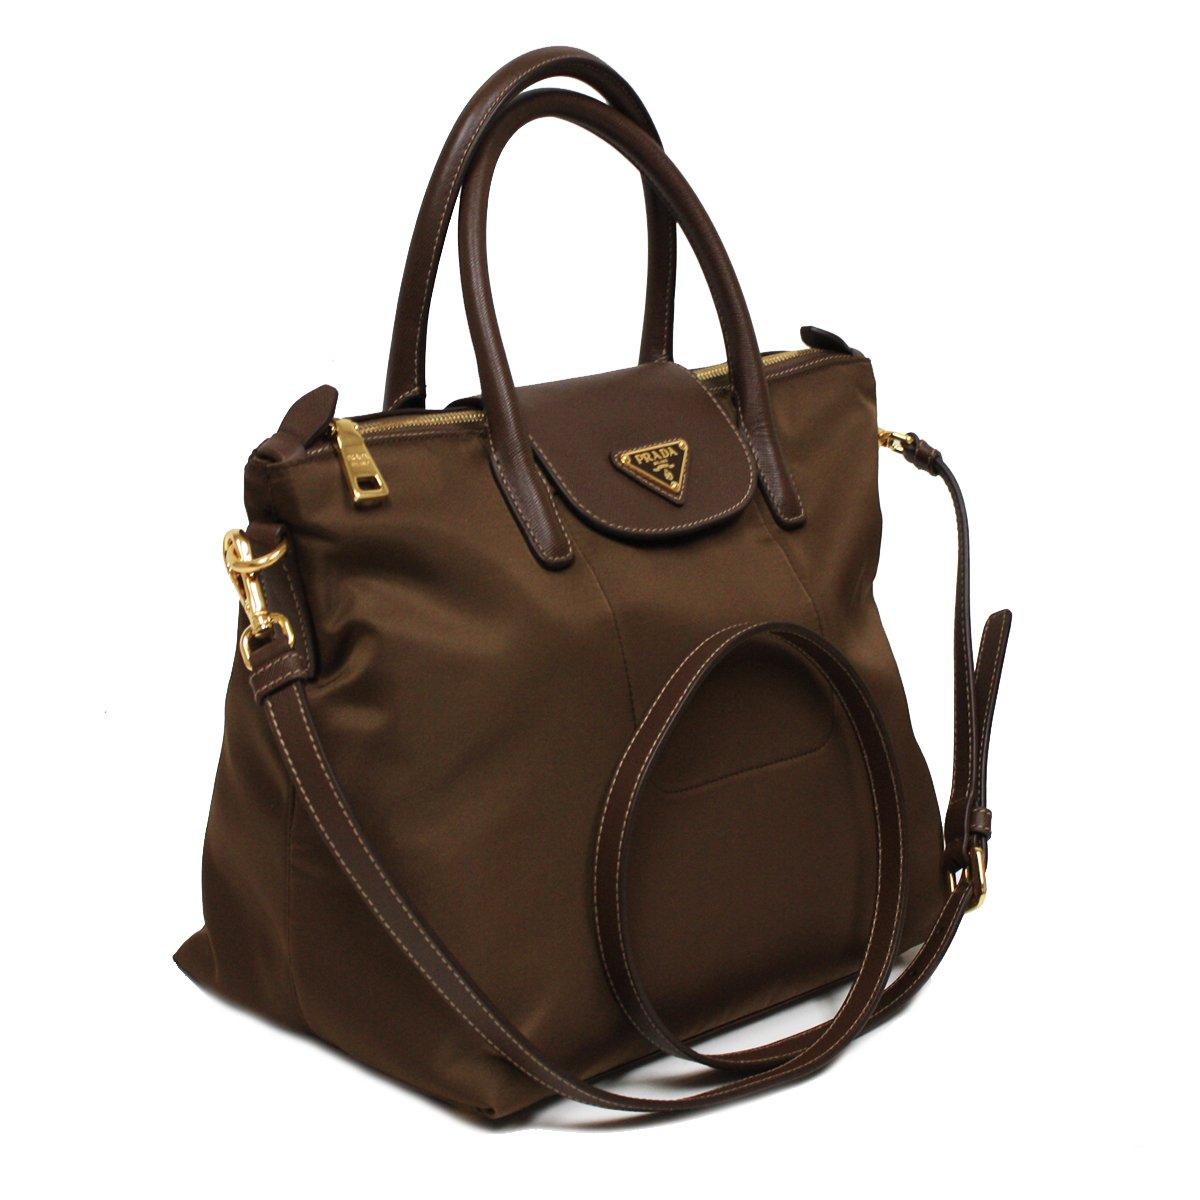 4a3804977ab8 Prada BN2106 Corinto Tessuto Saffian Brown Nylon Leather Shopping Tote Bag:  Amazon.ca: Shoes & Handbags